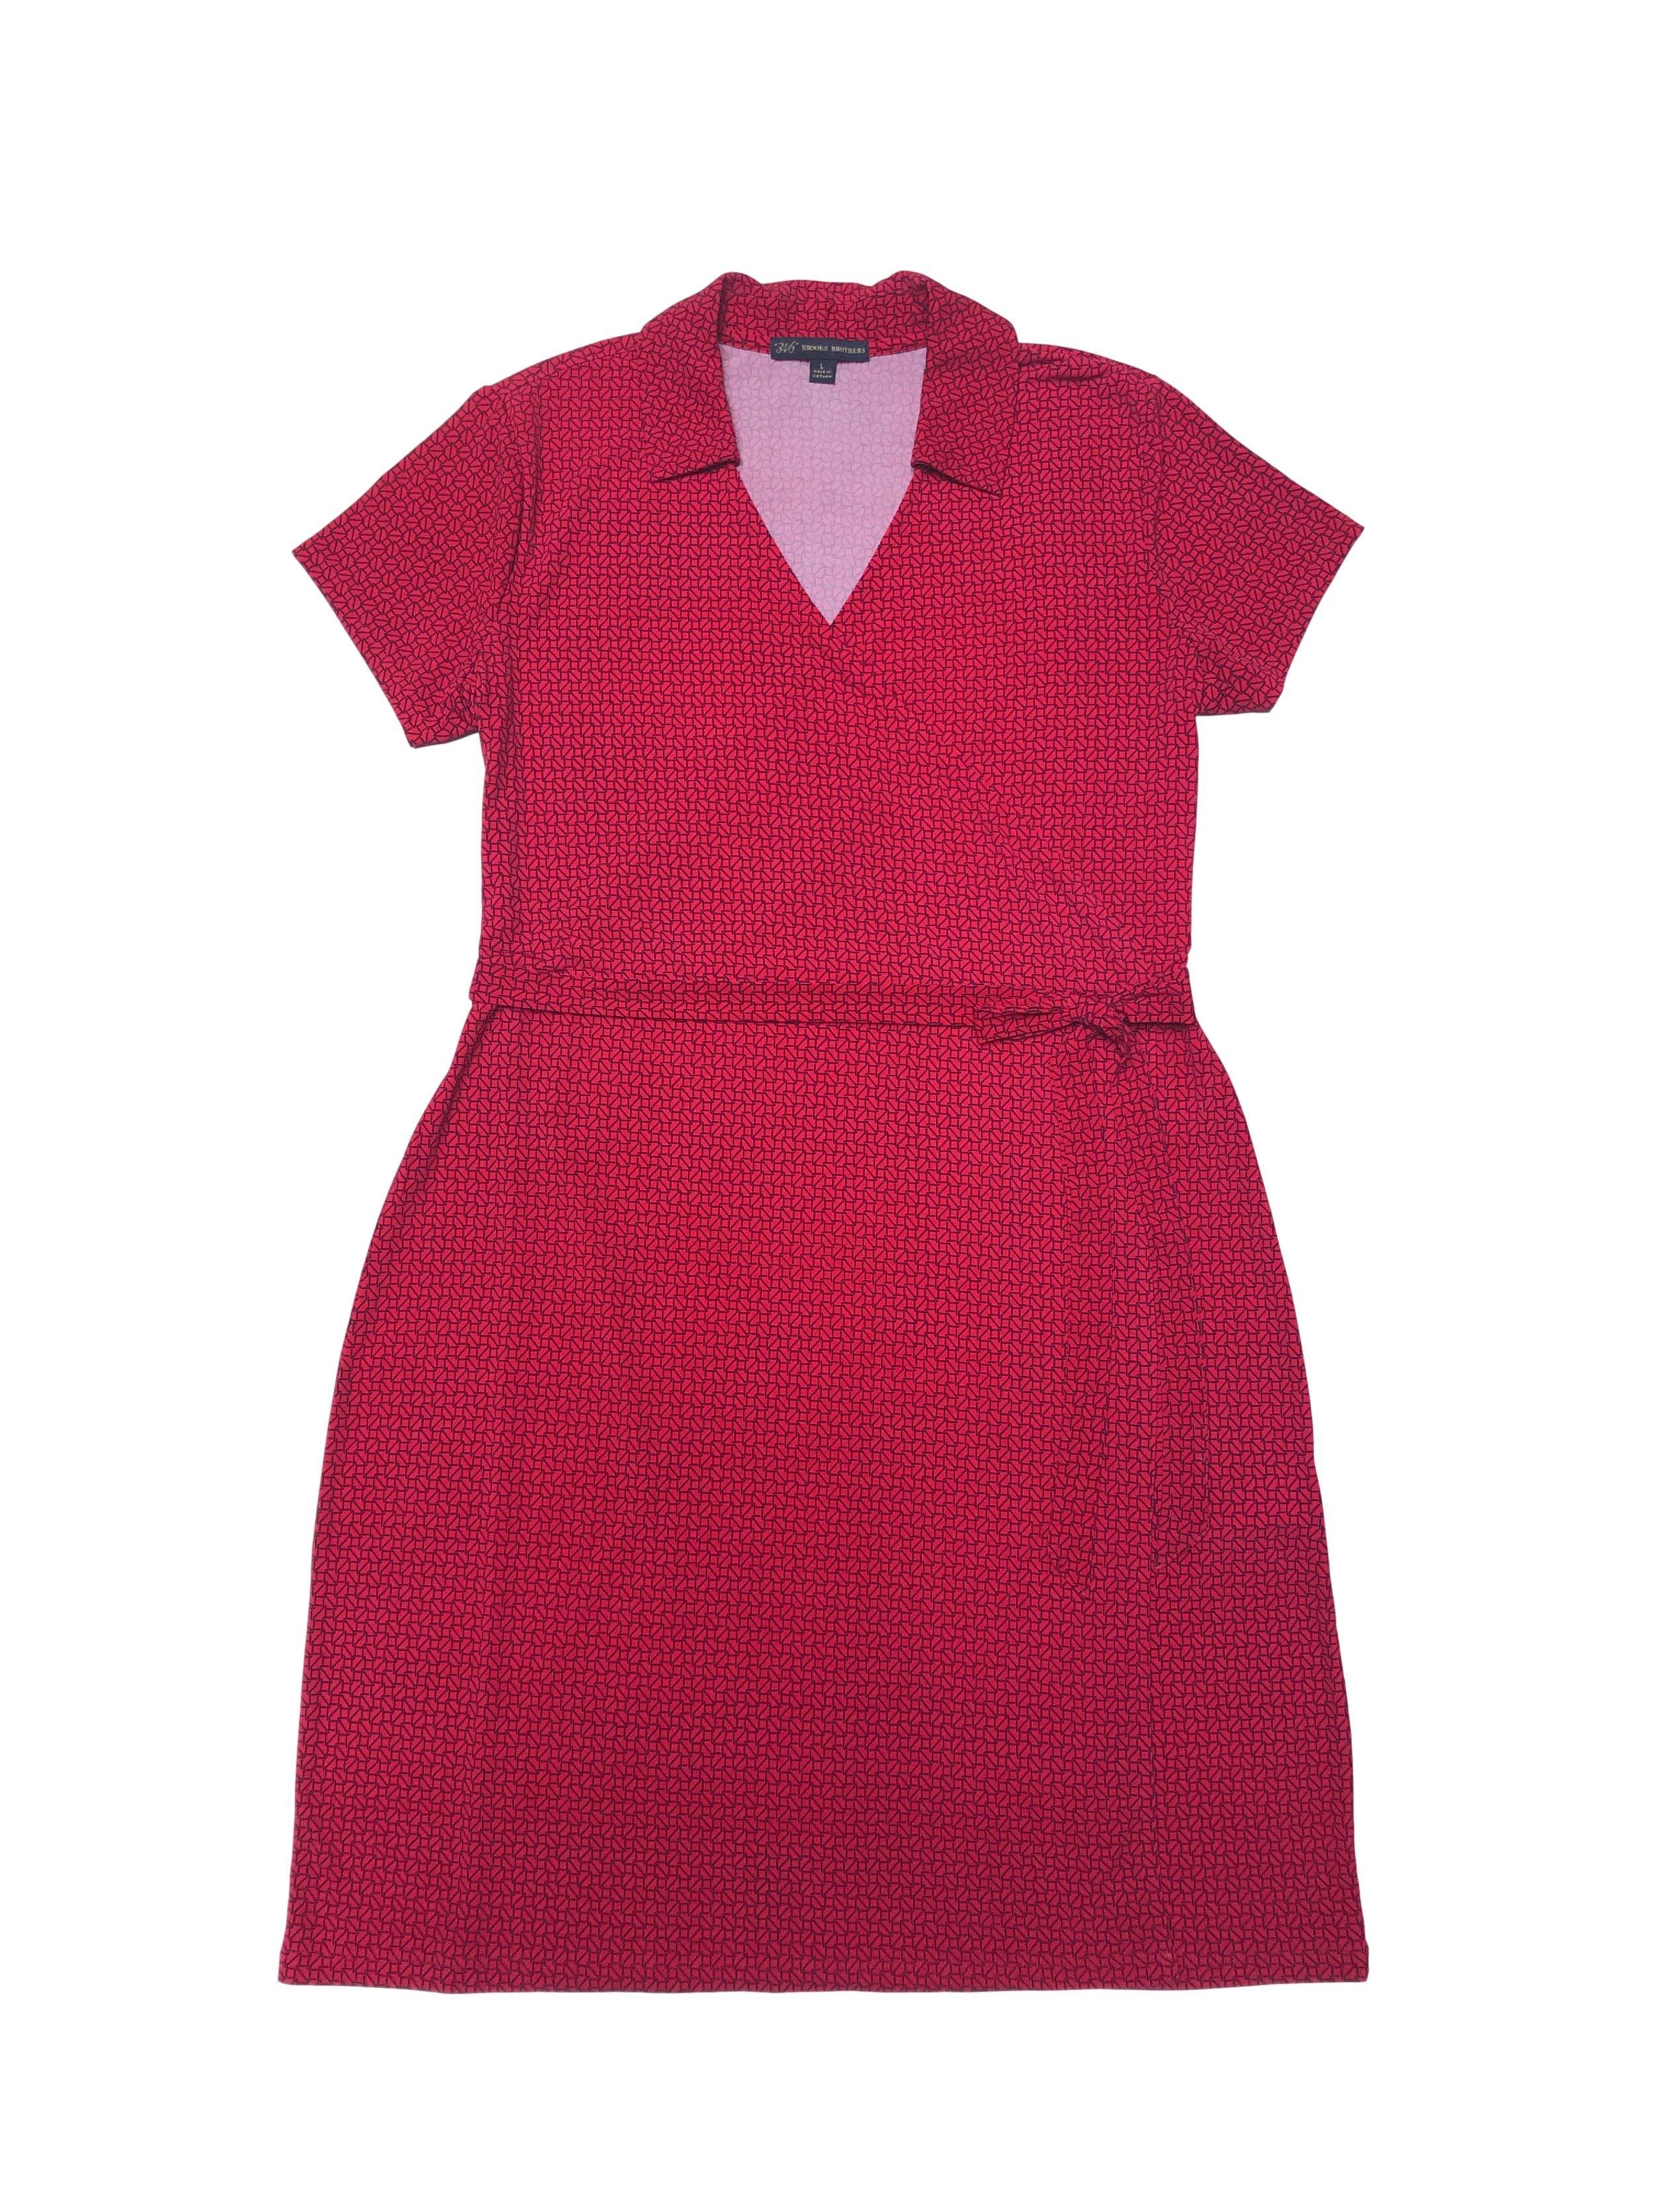 Vestido Brooks Brothers de tala stretch roja con print, escote cruzado y cinto para amarrar. Largo 100cm. Precio original S/ 650